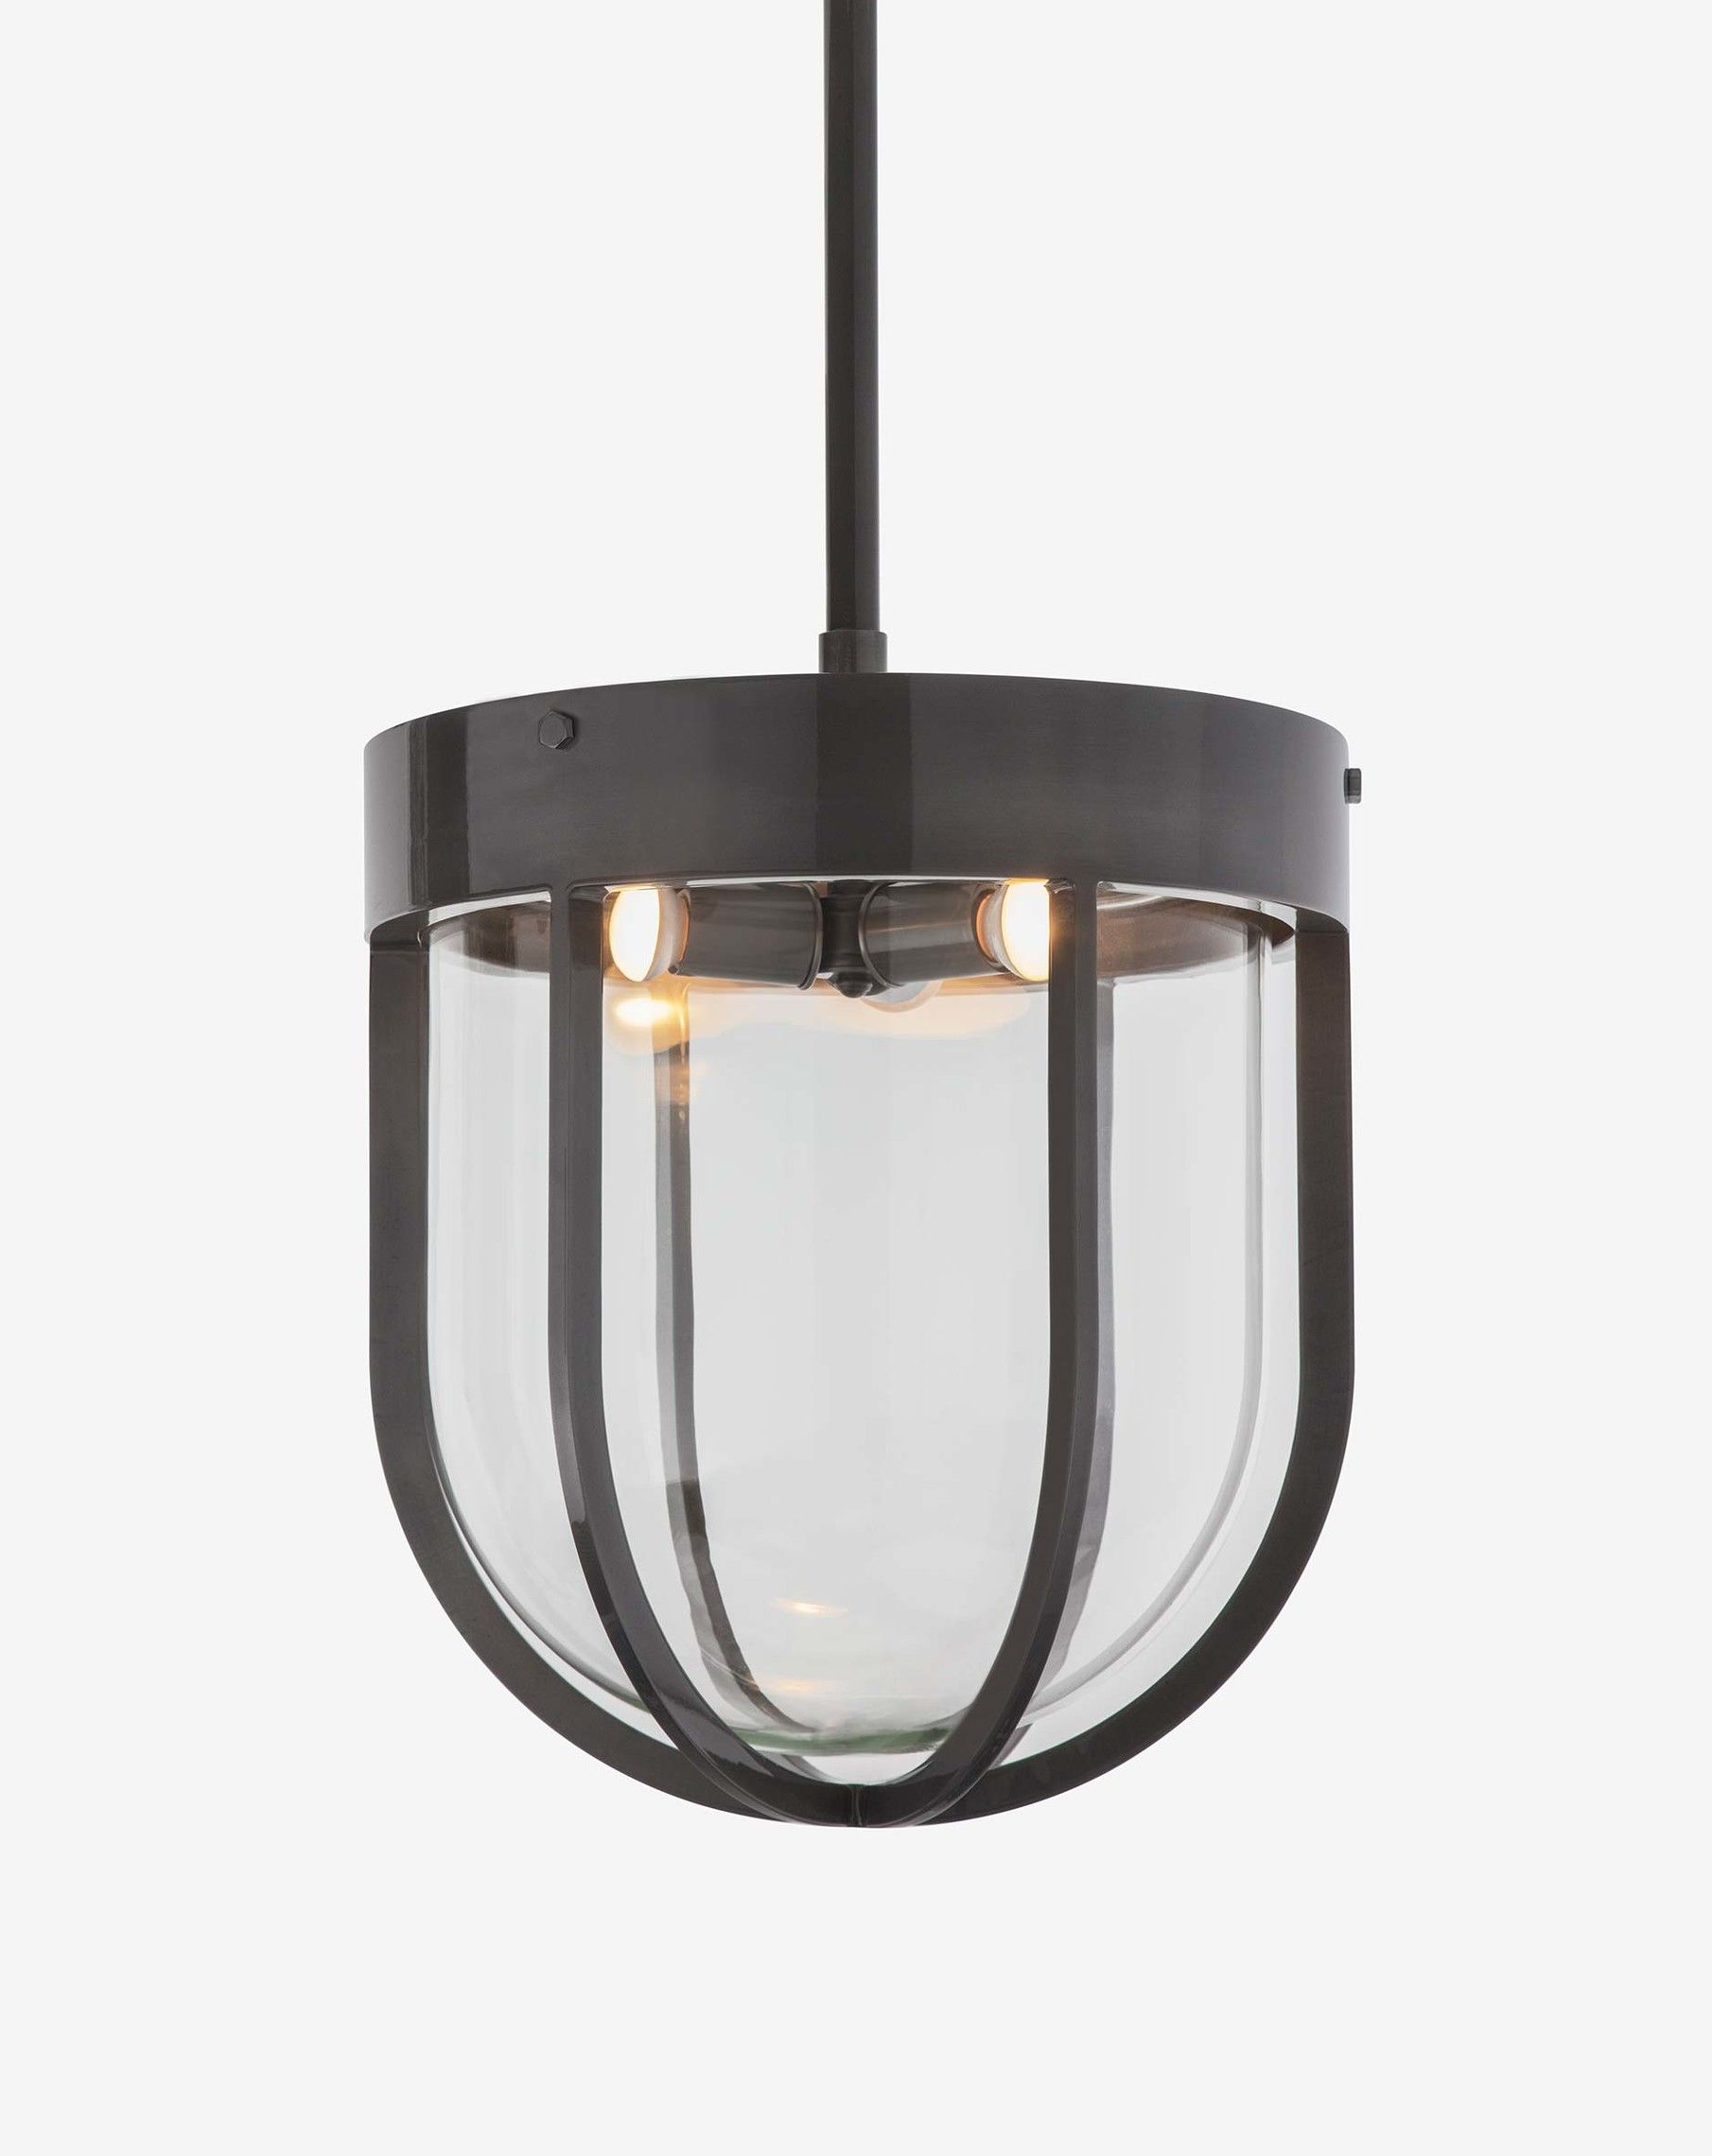 Urban electric lighting